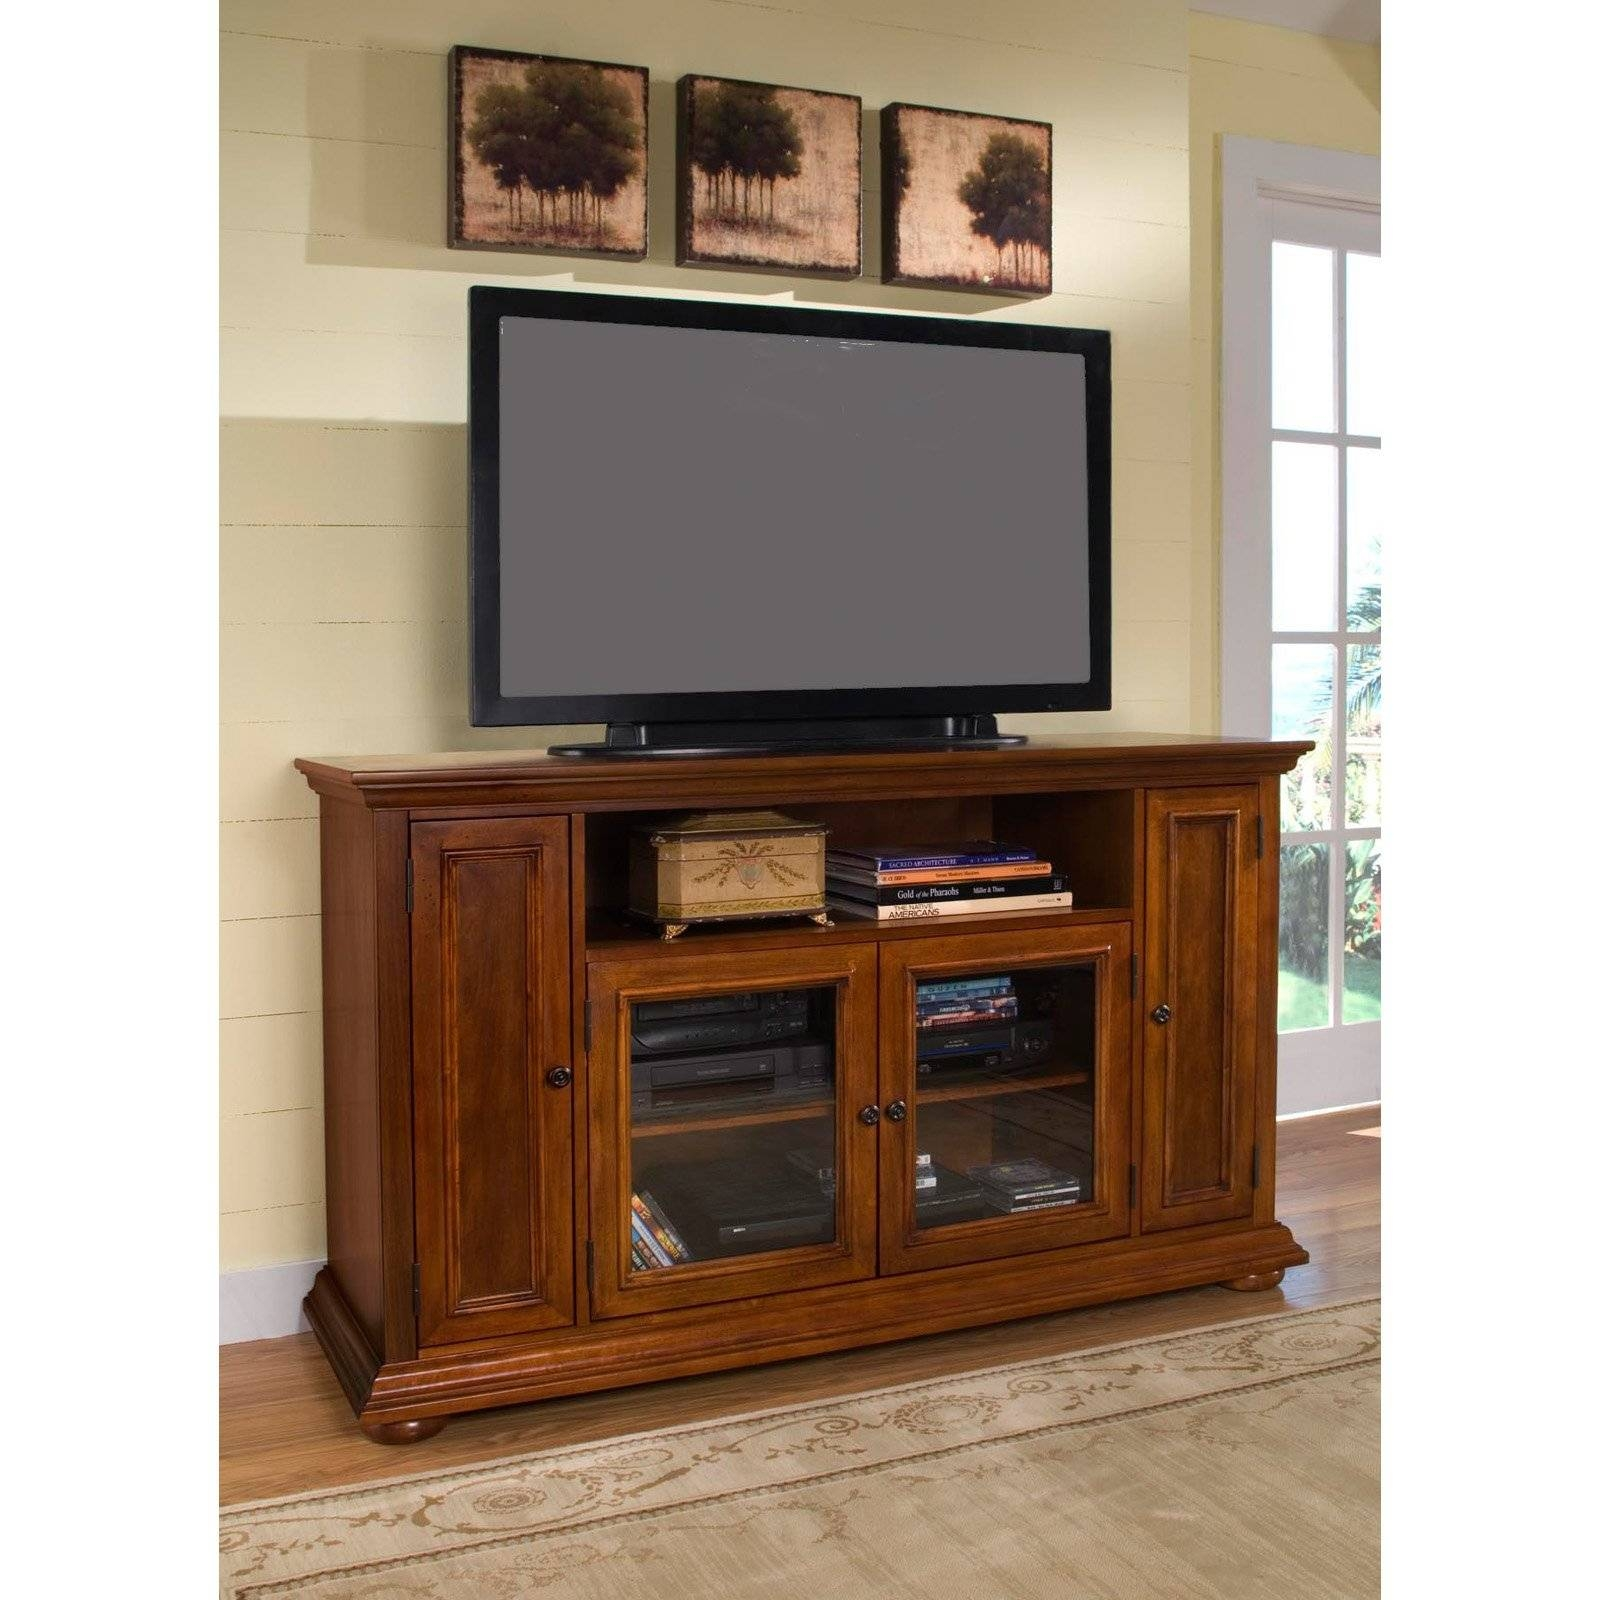 Oak Corner Tv Cabinets For Flat Screens | Memsaheb pertaining to Oak Tv Cabinets For Flat Screens (Image 4 of 15)